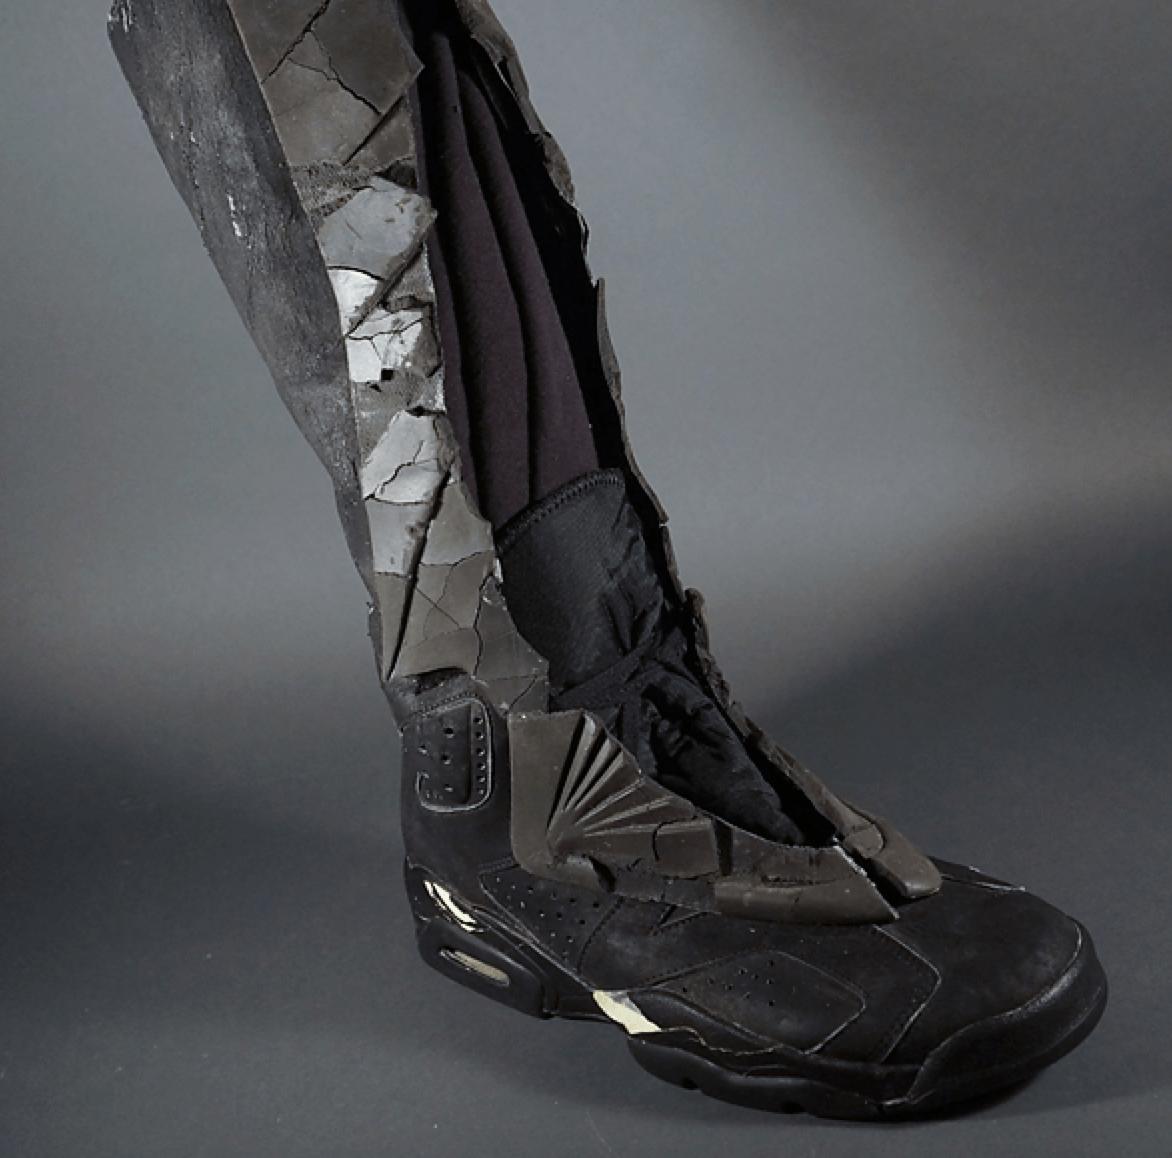 Nike Air Max 95 Batman Release Date